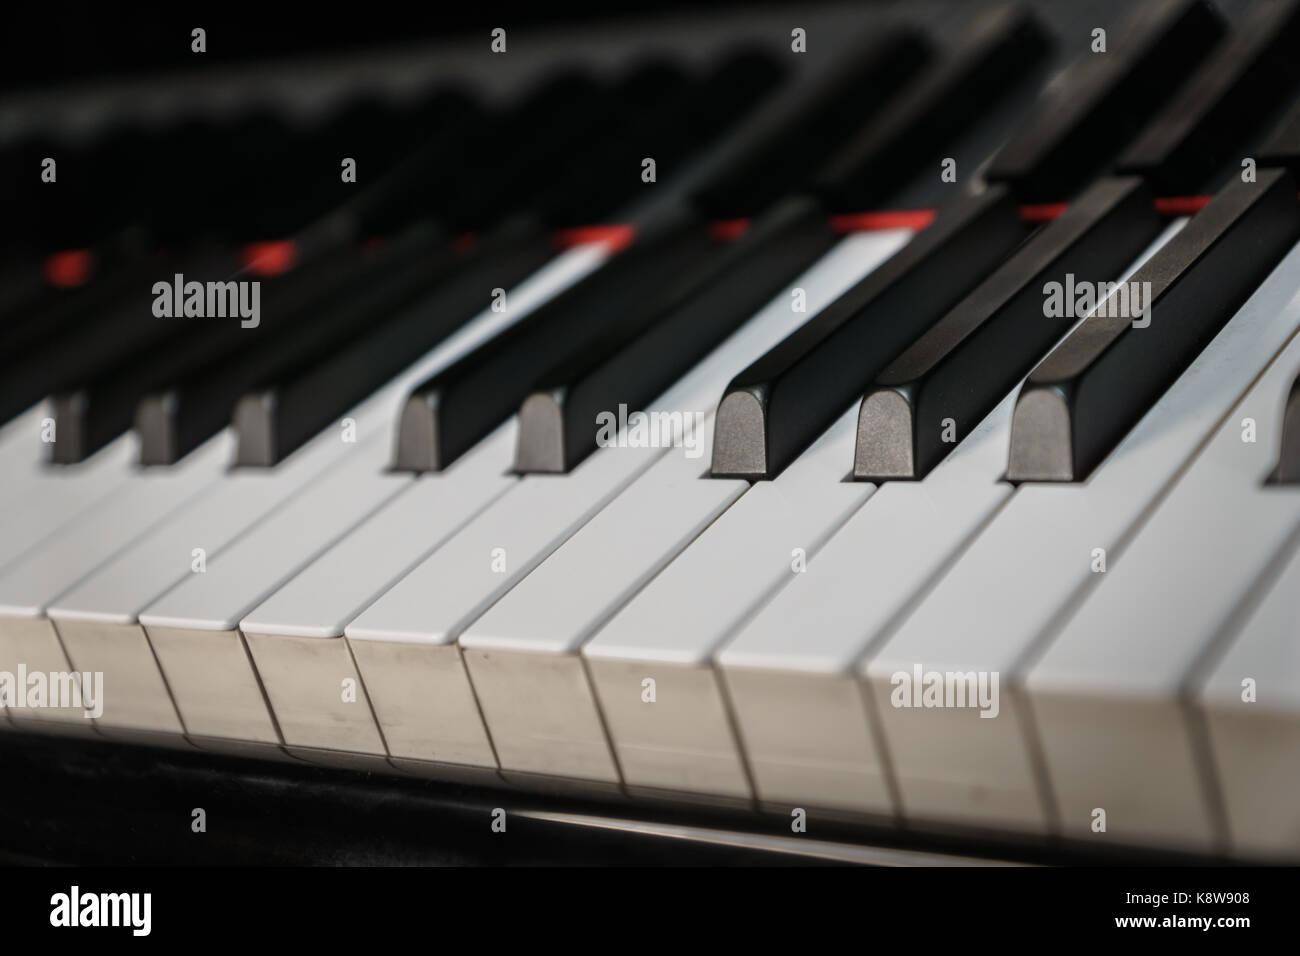 Piano keys on black classical grand piano play - Stock Image